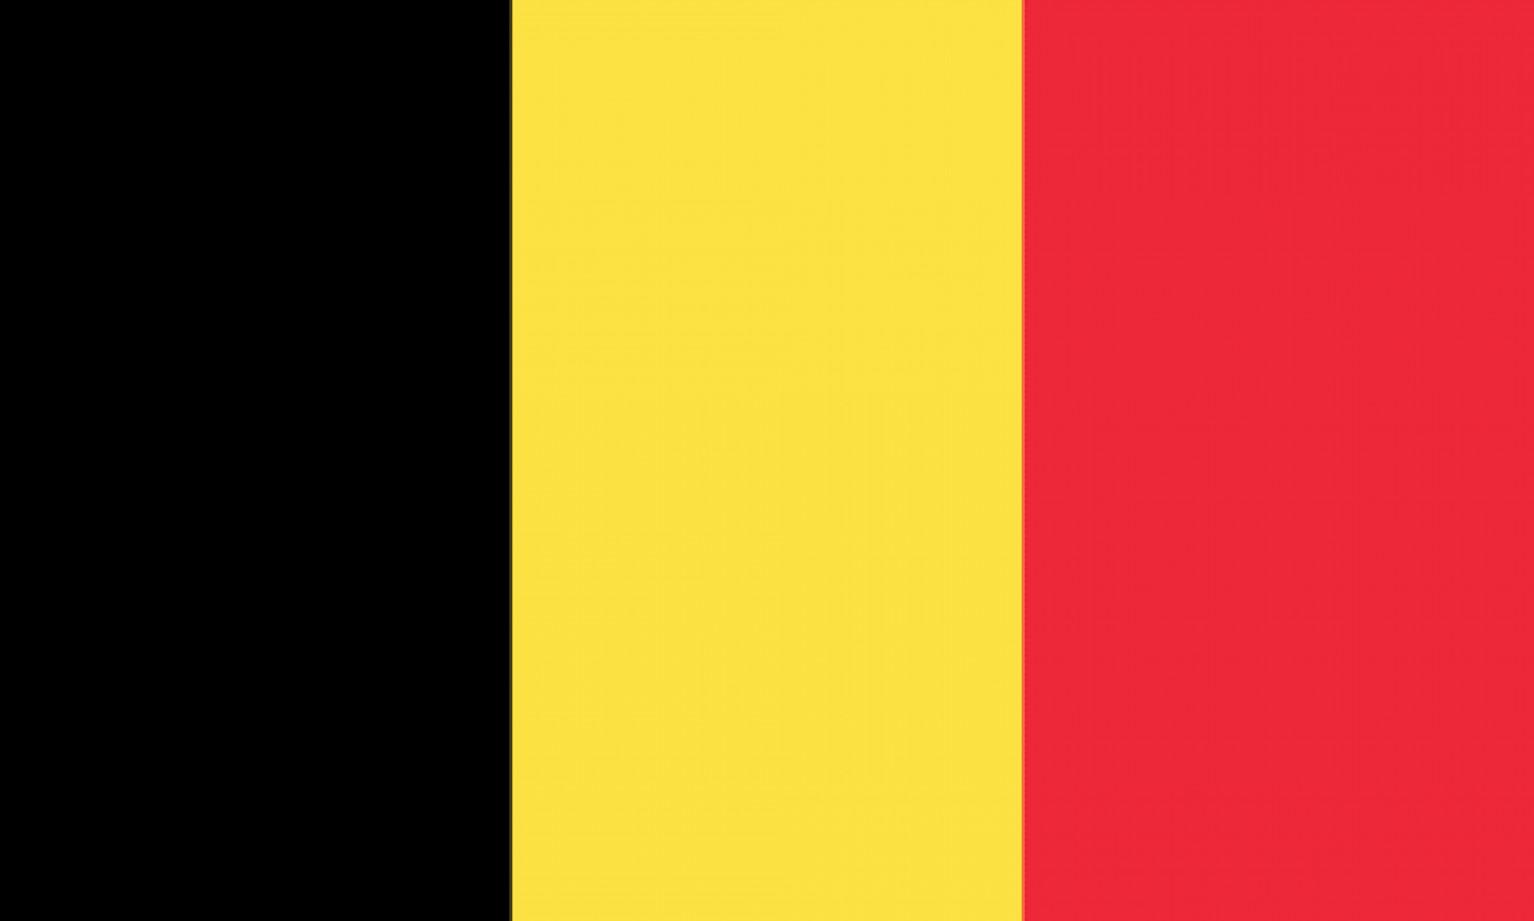 Belgium Peer-to-Peer lending platforms and market